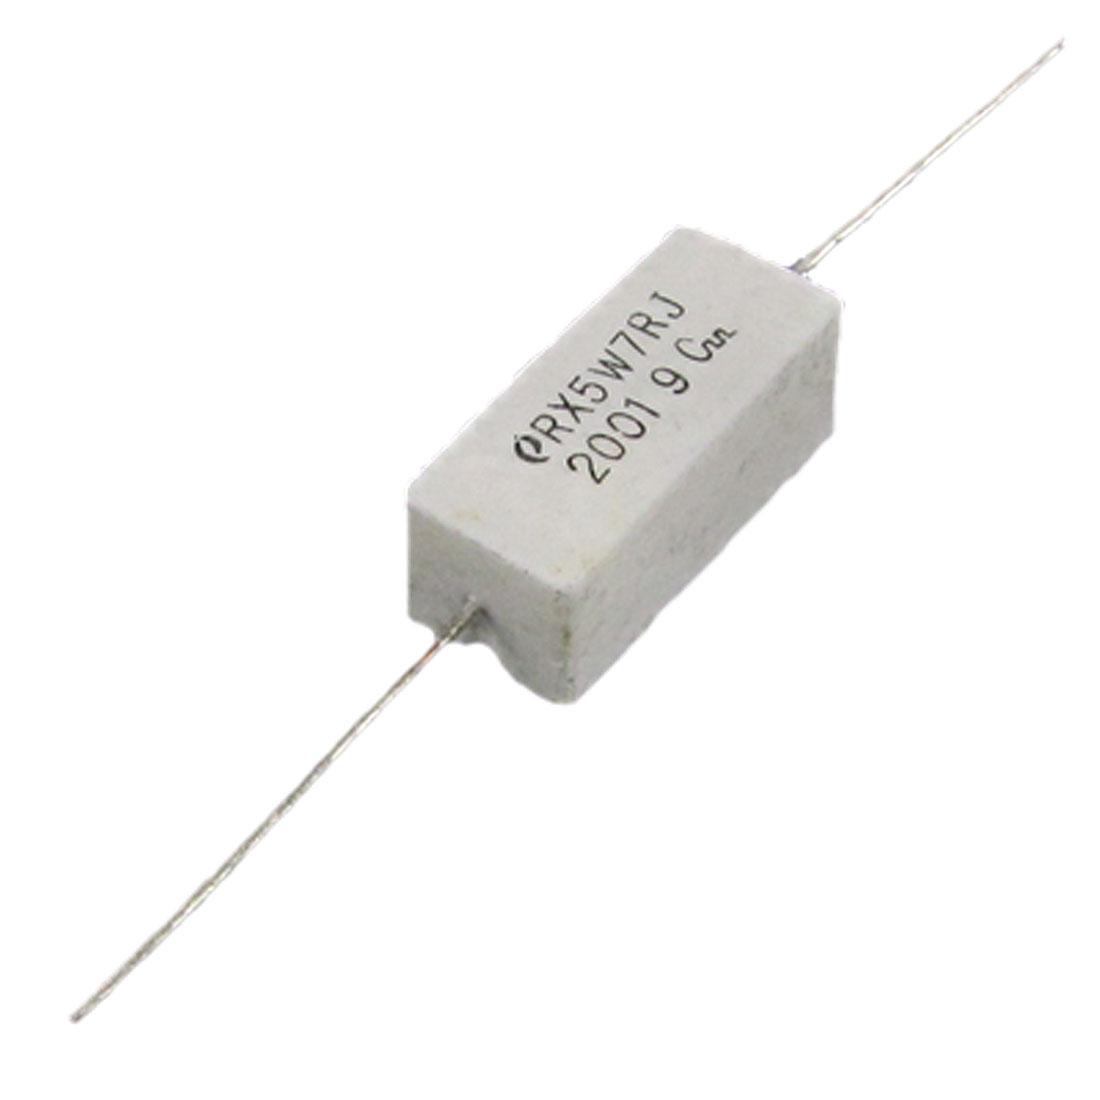 10 Pcs Wire Wound Ceramic Cement Power Resistor 7 Ohm 5W 5%